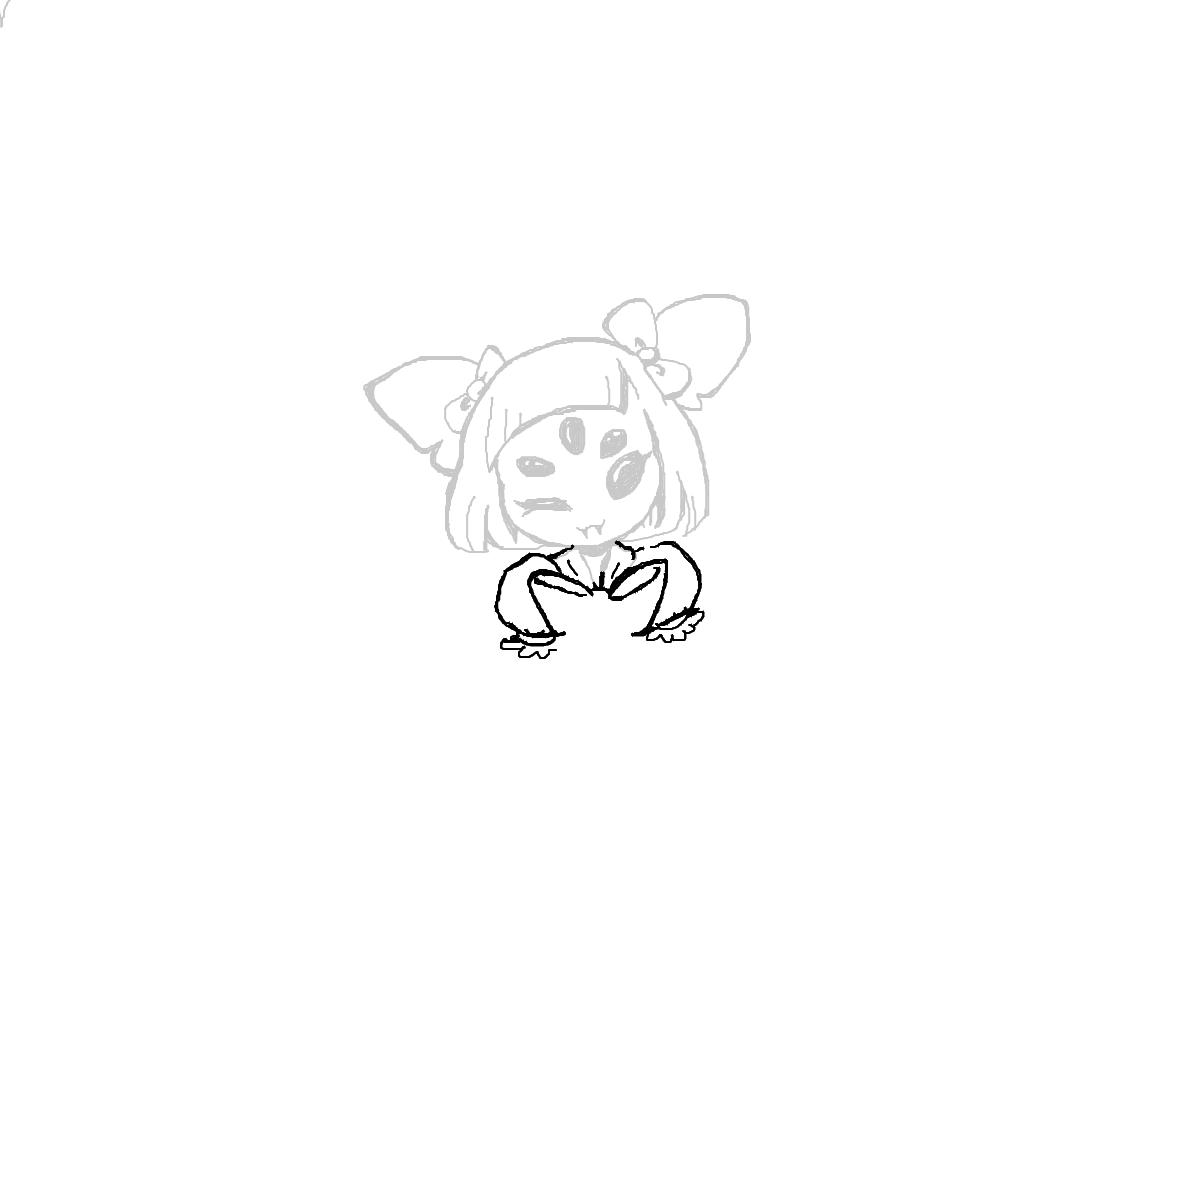 BAAAM drawing#23655 lat:41.0459365844726560lng: -79.6111145019531200